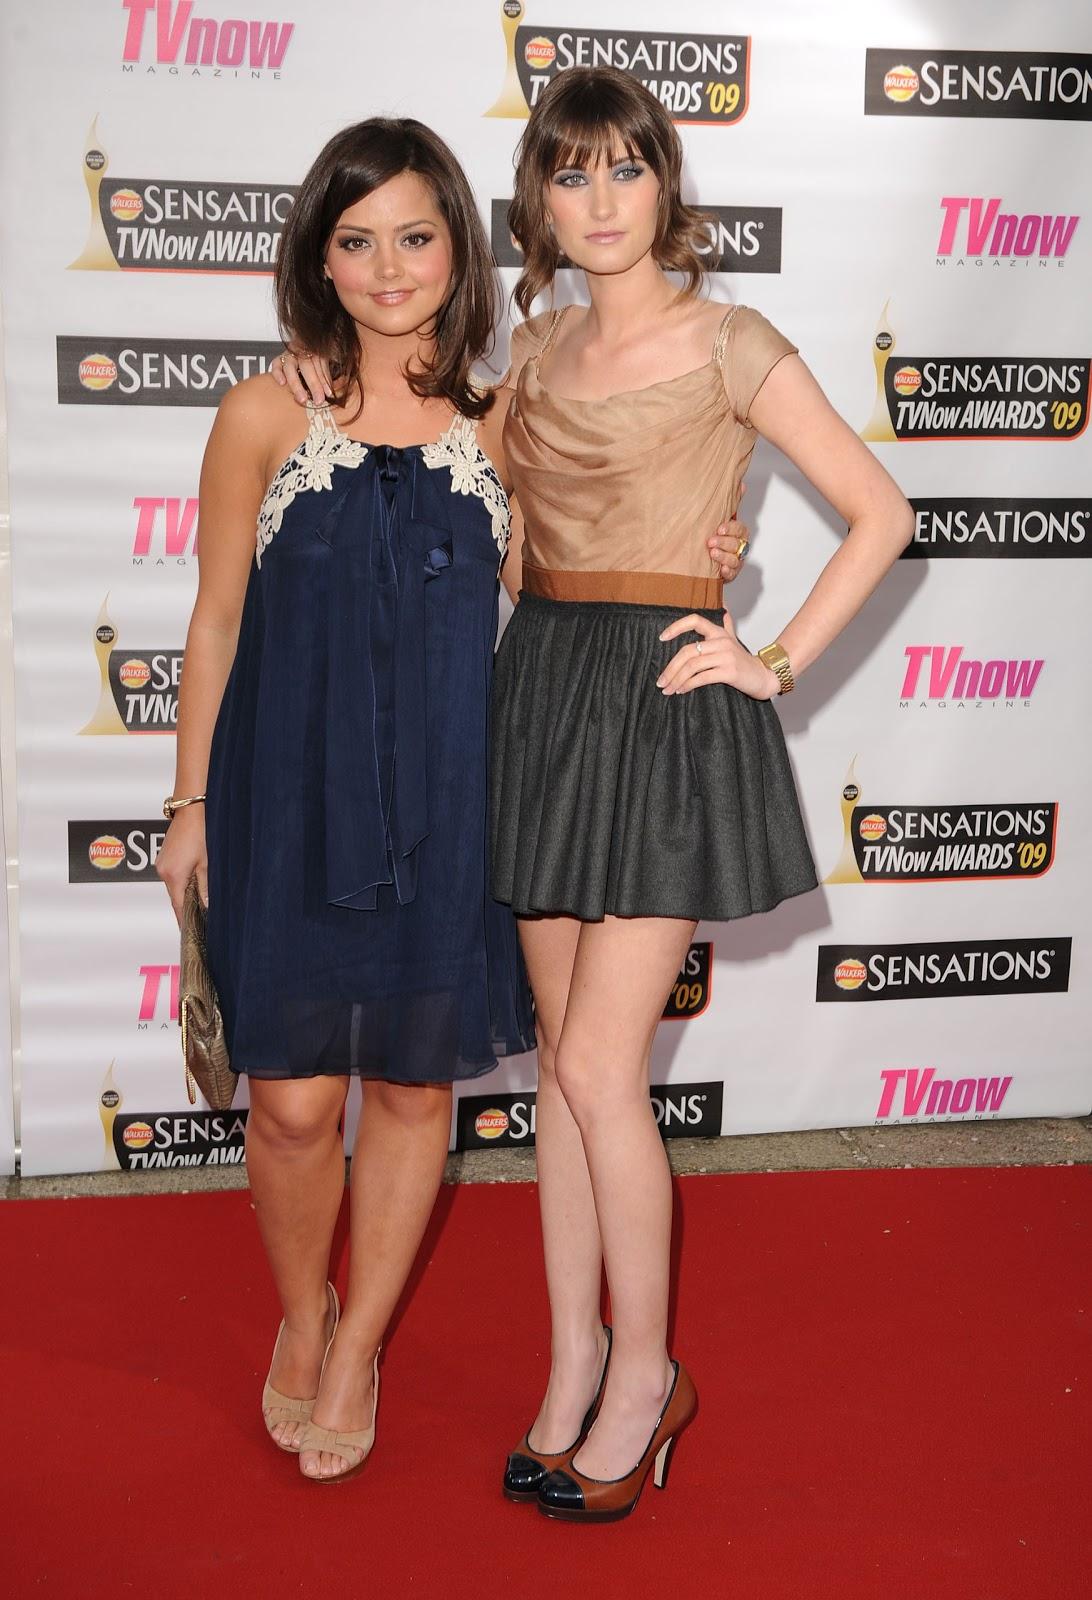 Jenna-Louise Coleman: Jenna-Louise Coleman feet